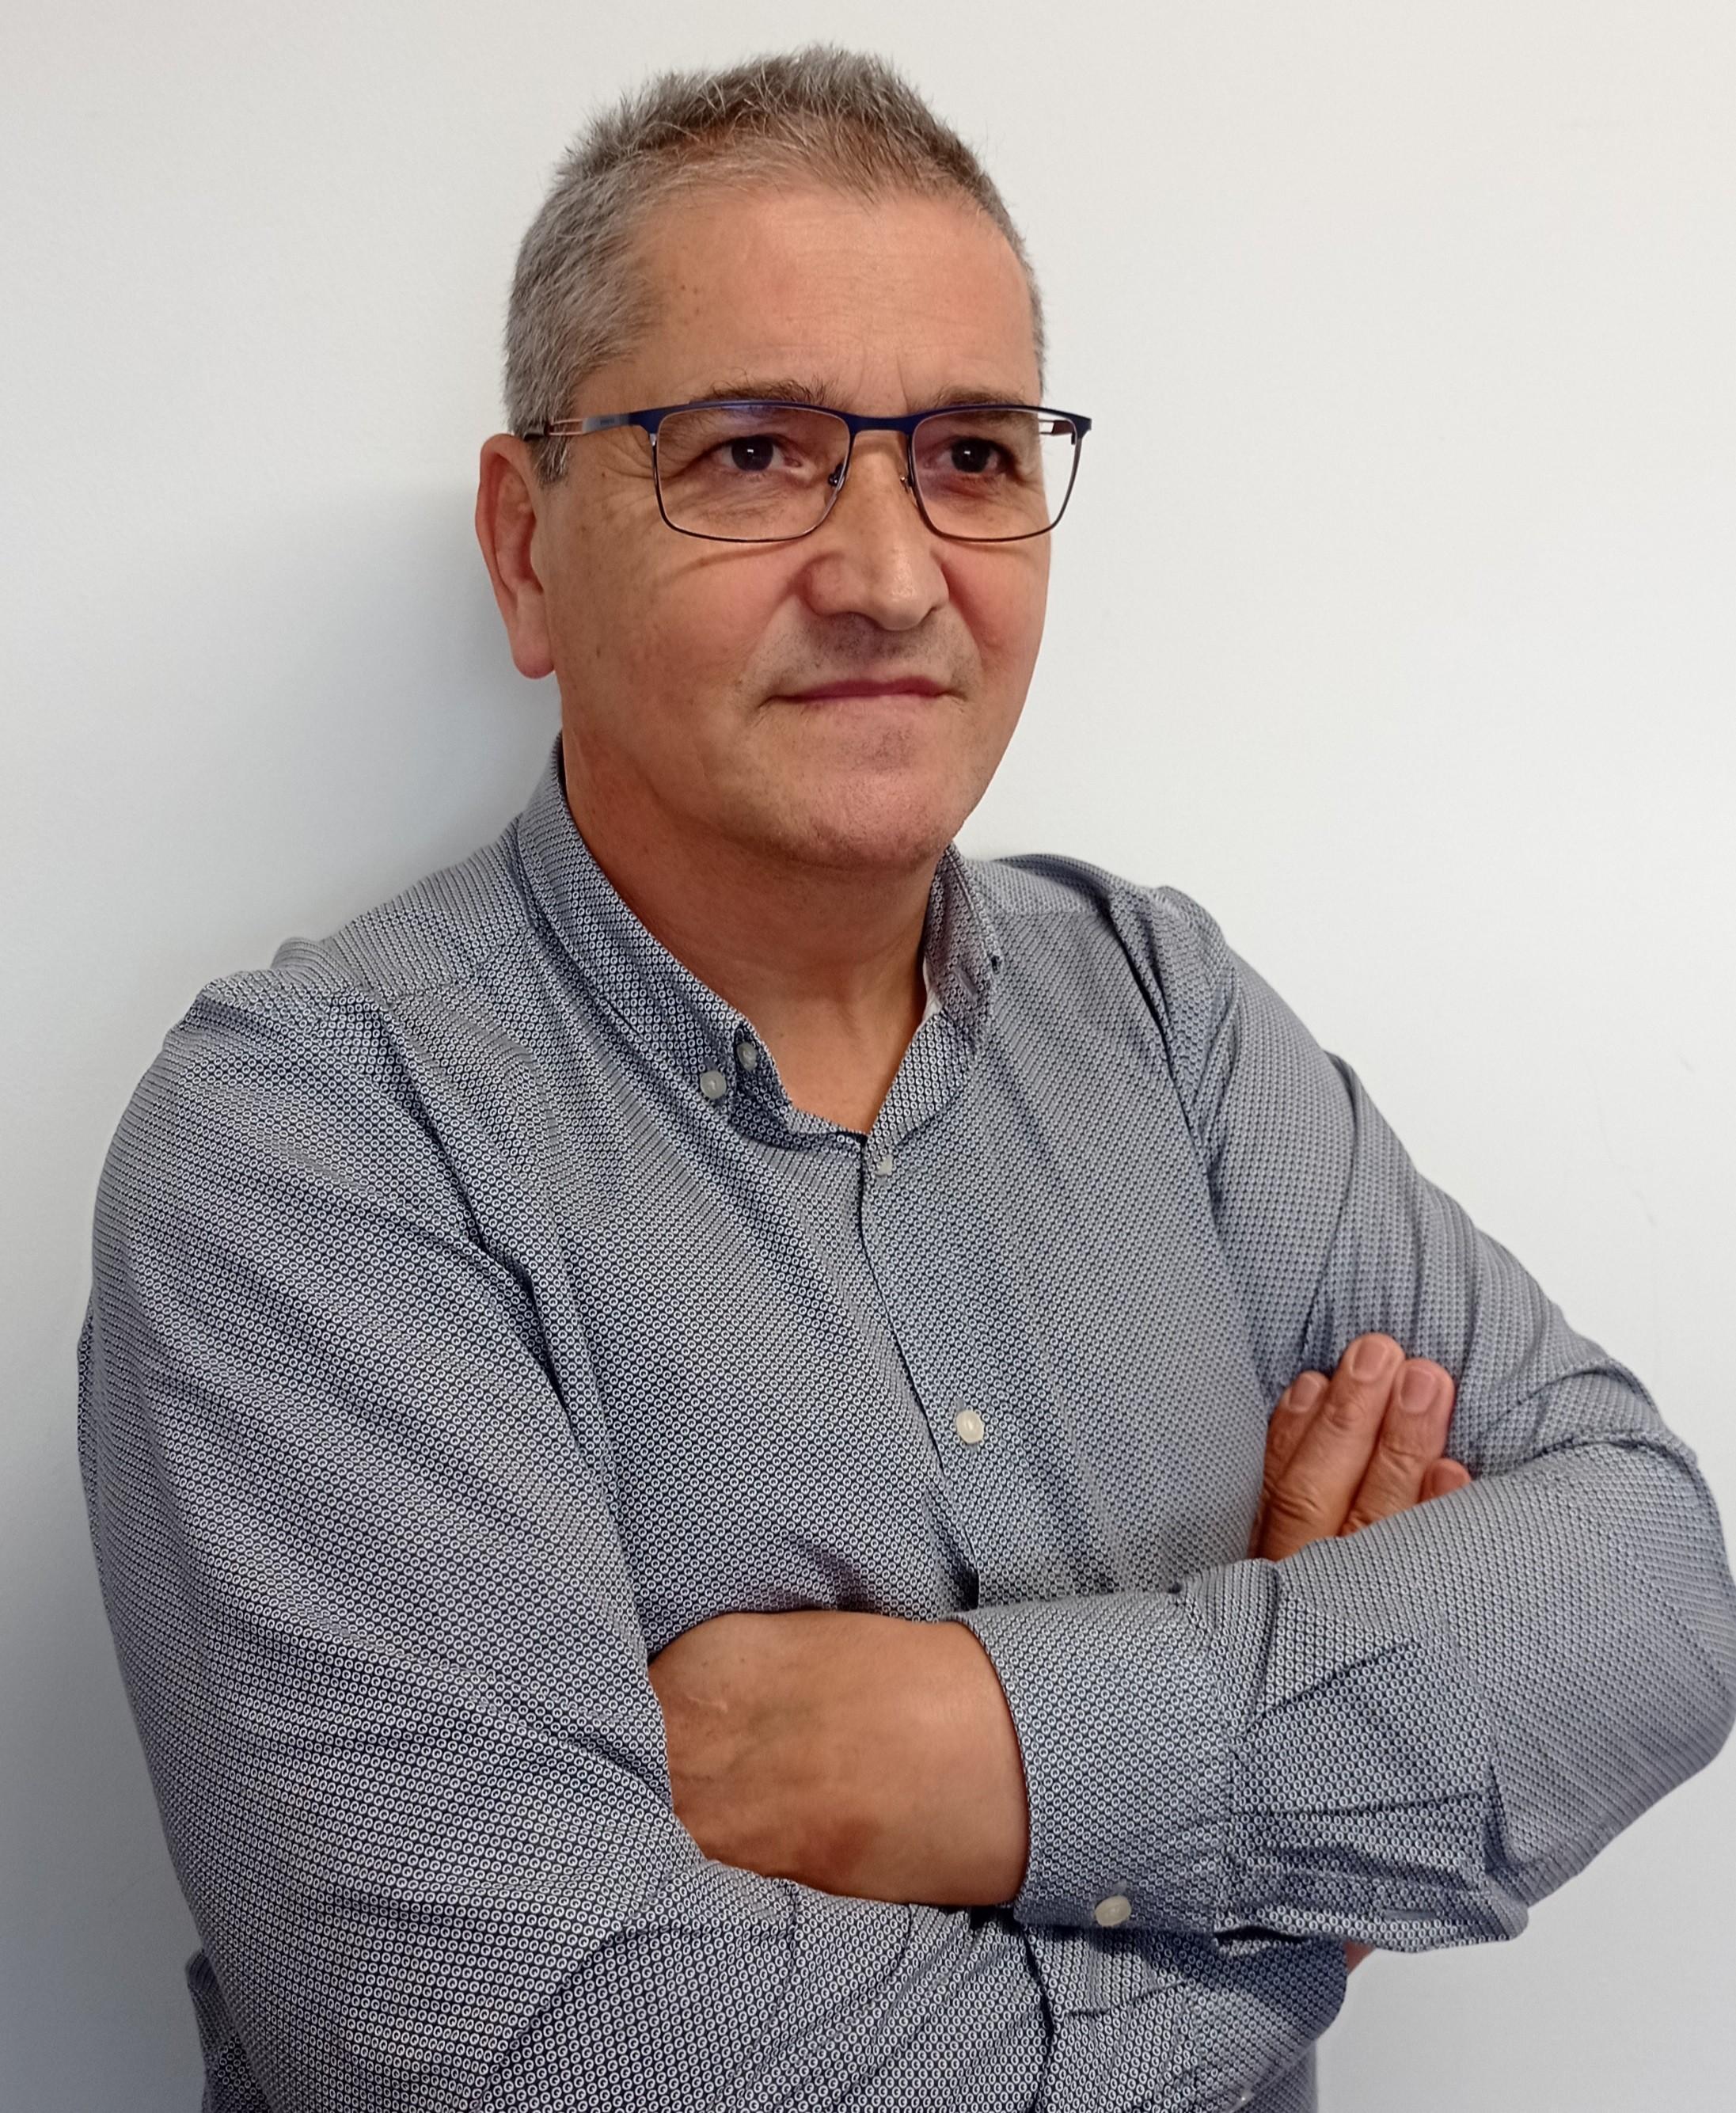 Juan Francisco Rodríguez Rodríguez